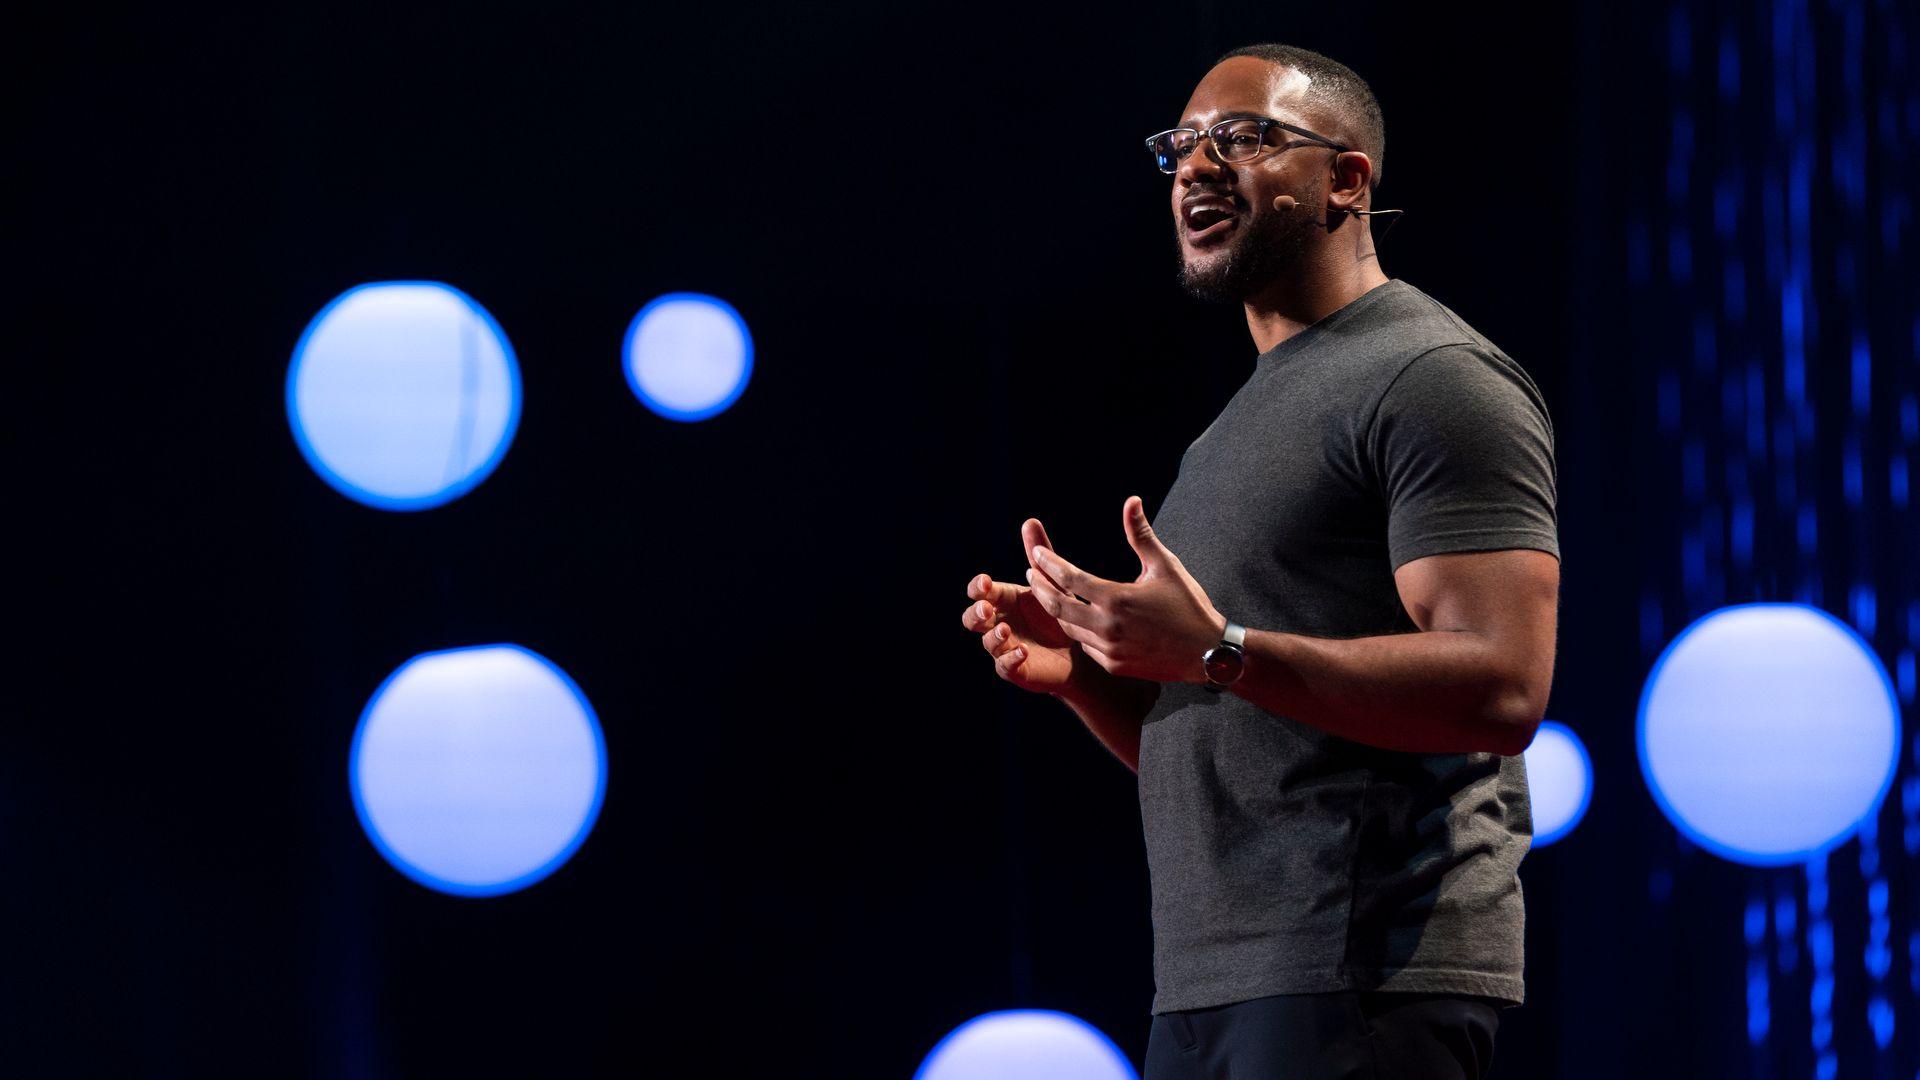 Raheem founder Brandon Anderson speaking at TED2019